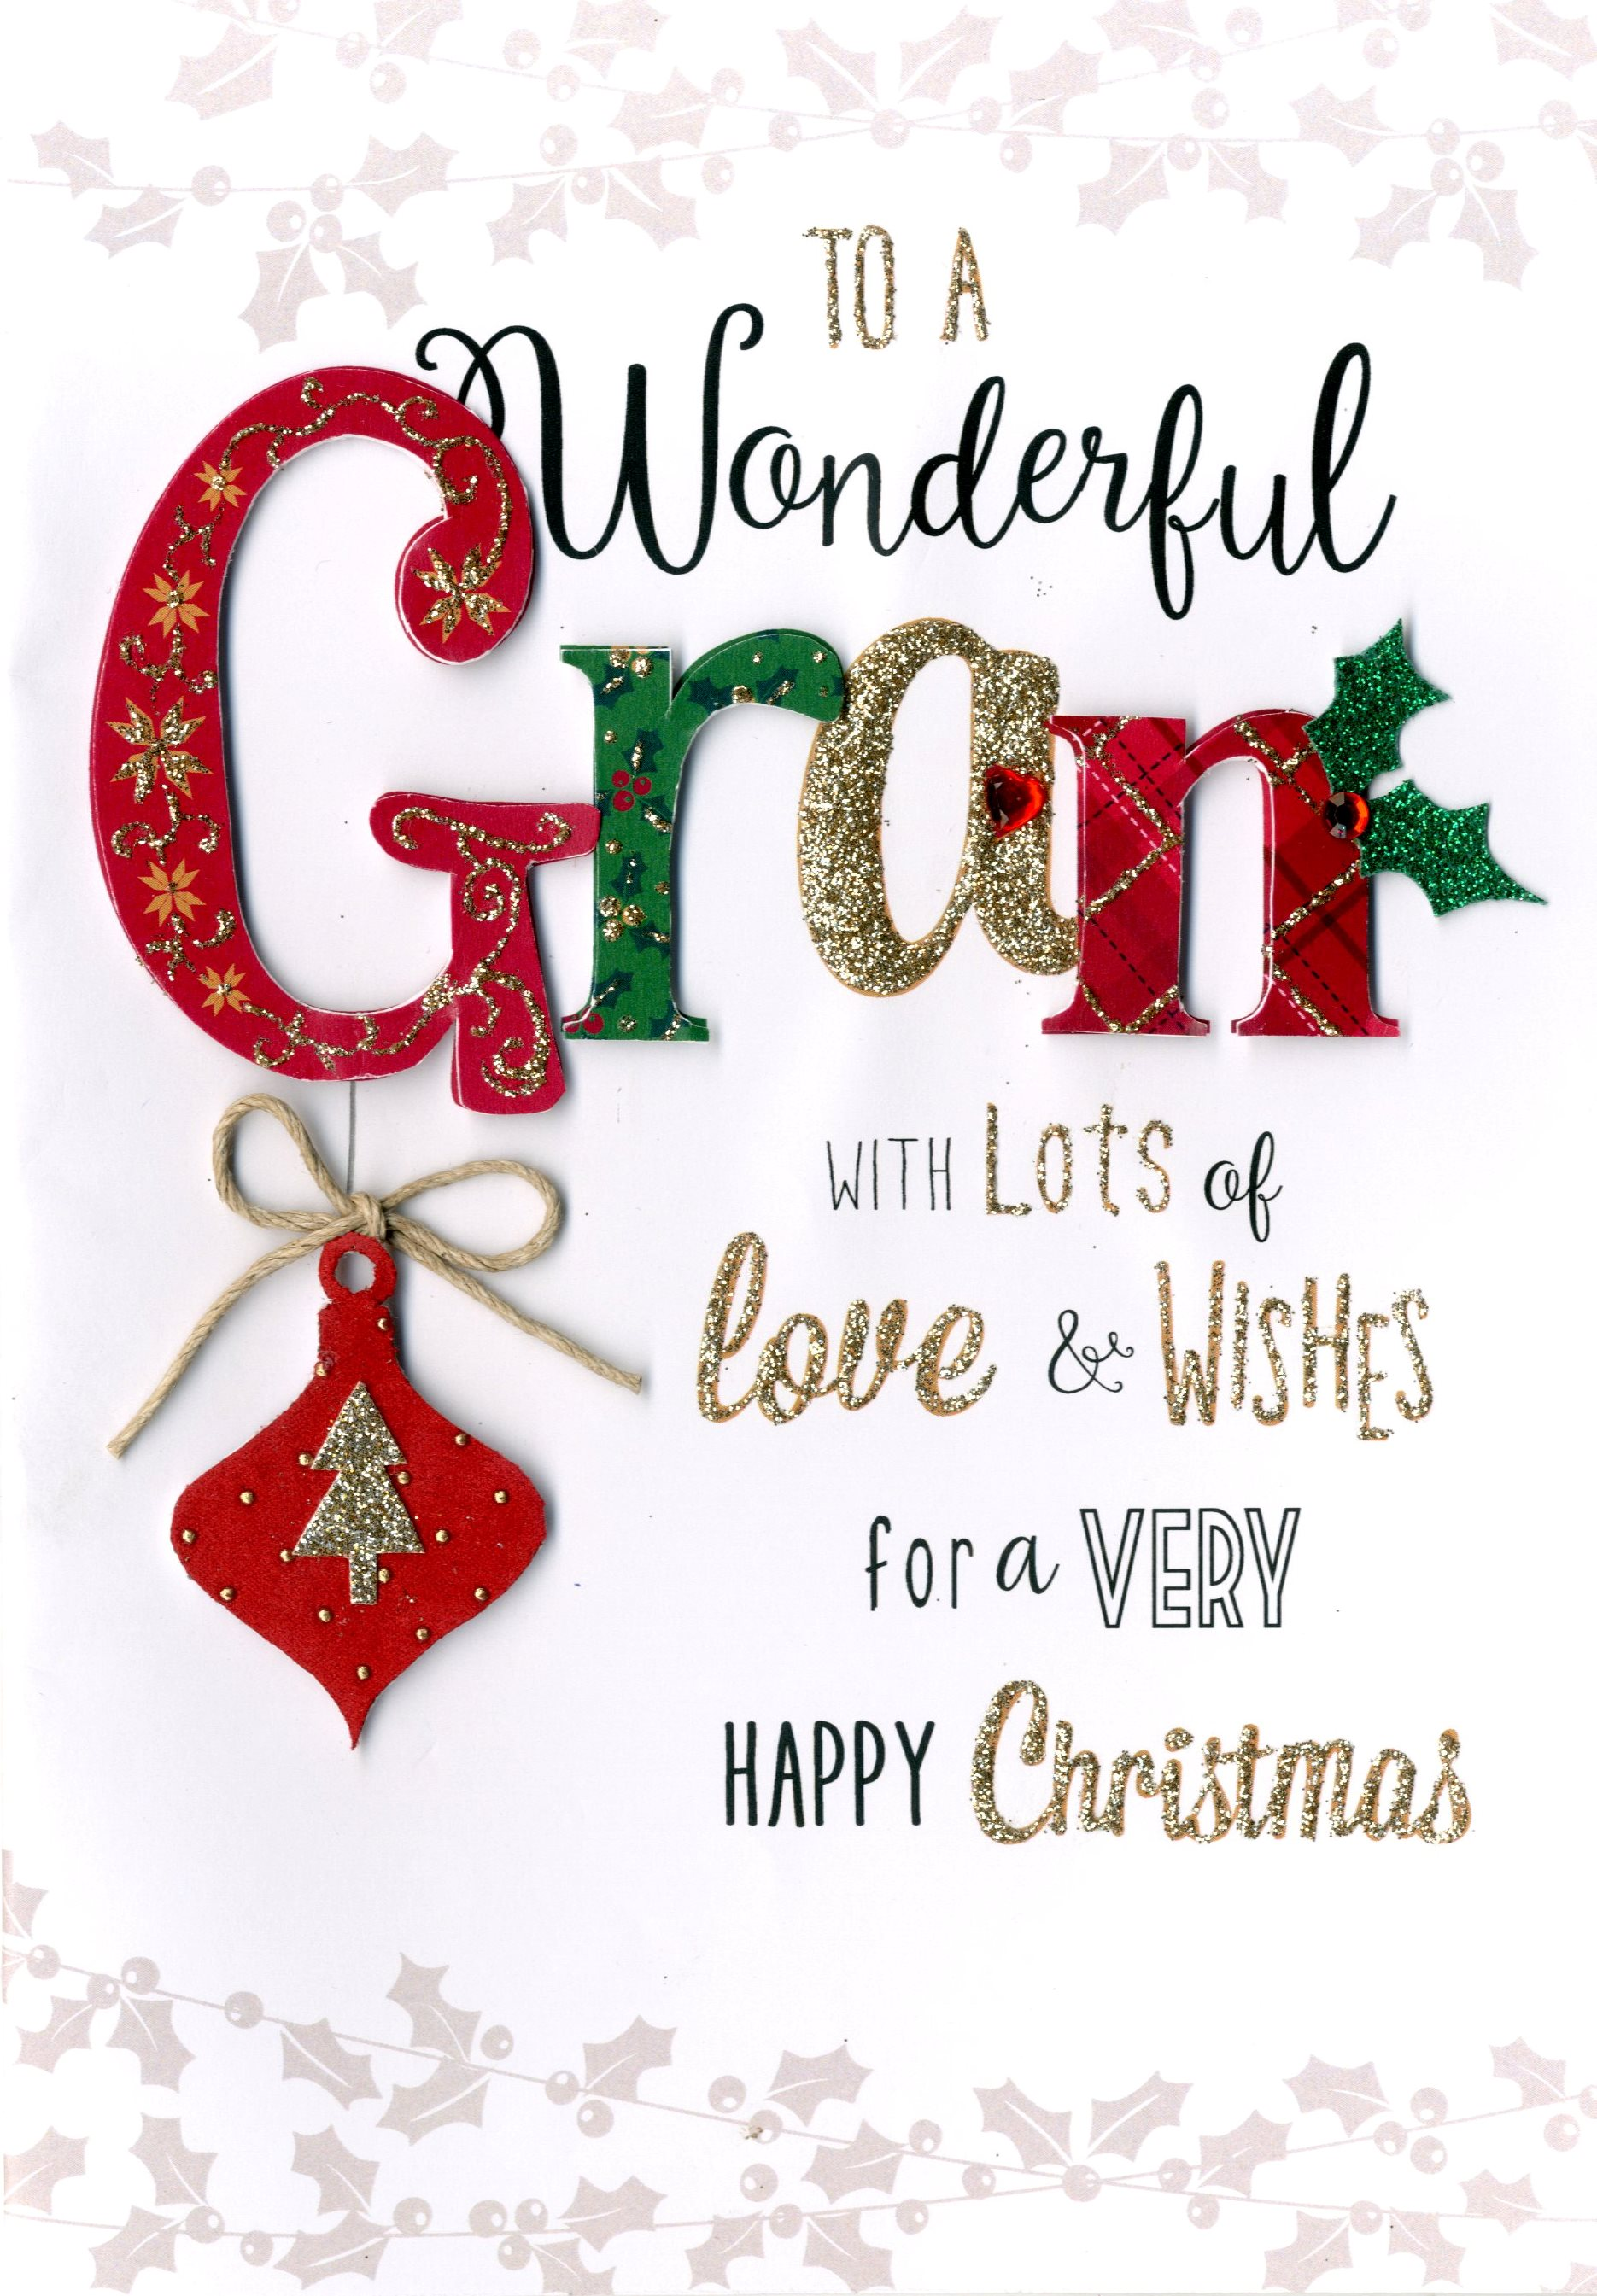 Lovely Gran Embellished Christmas Card